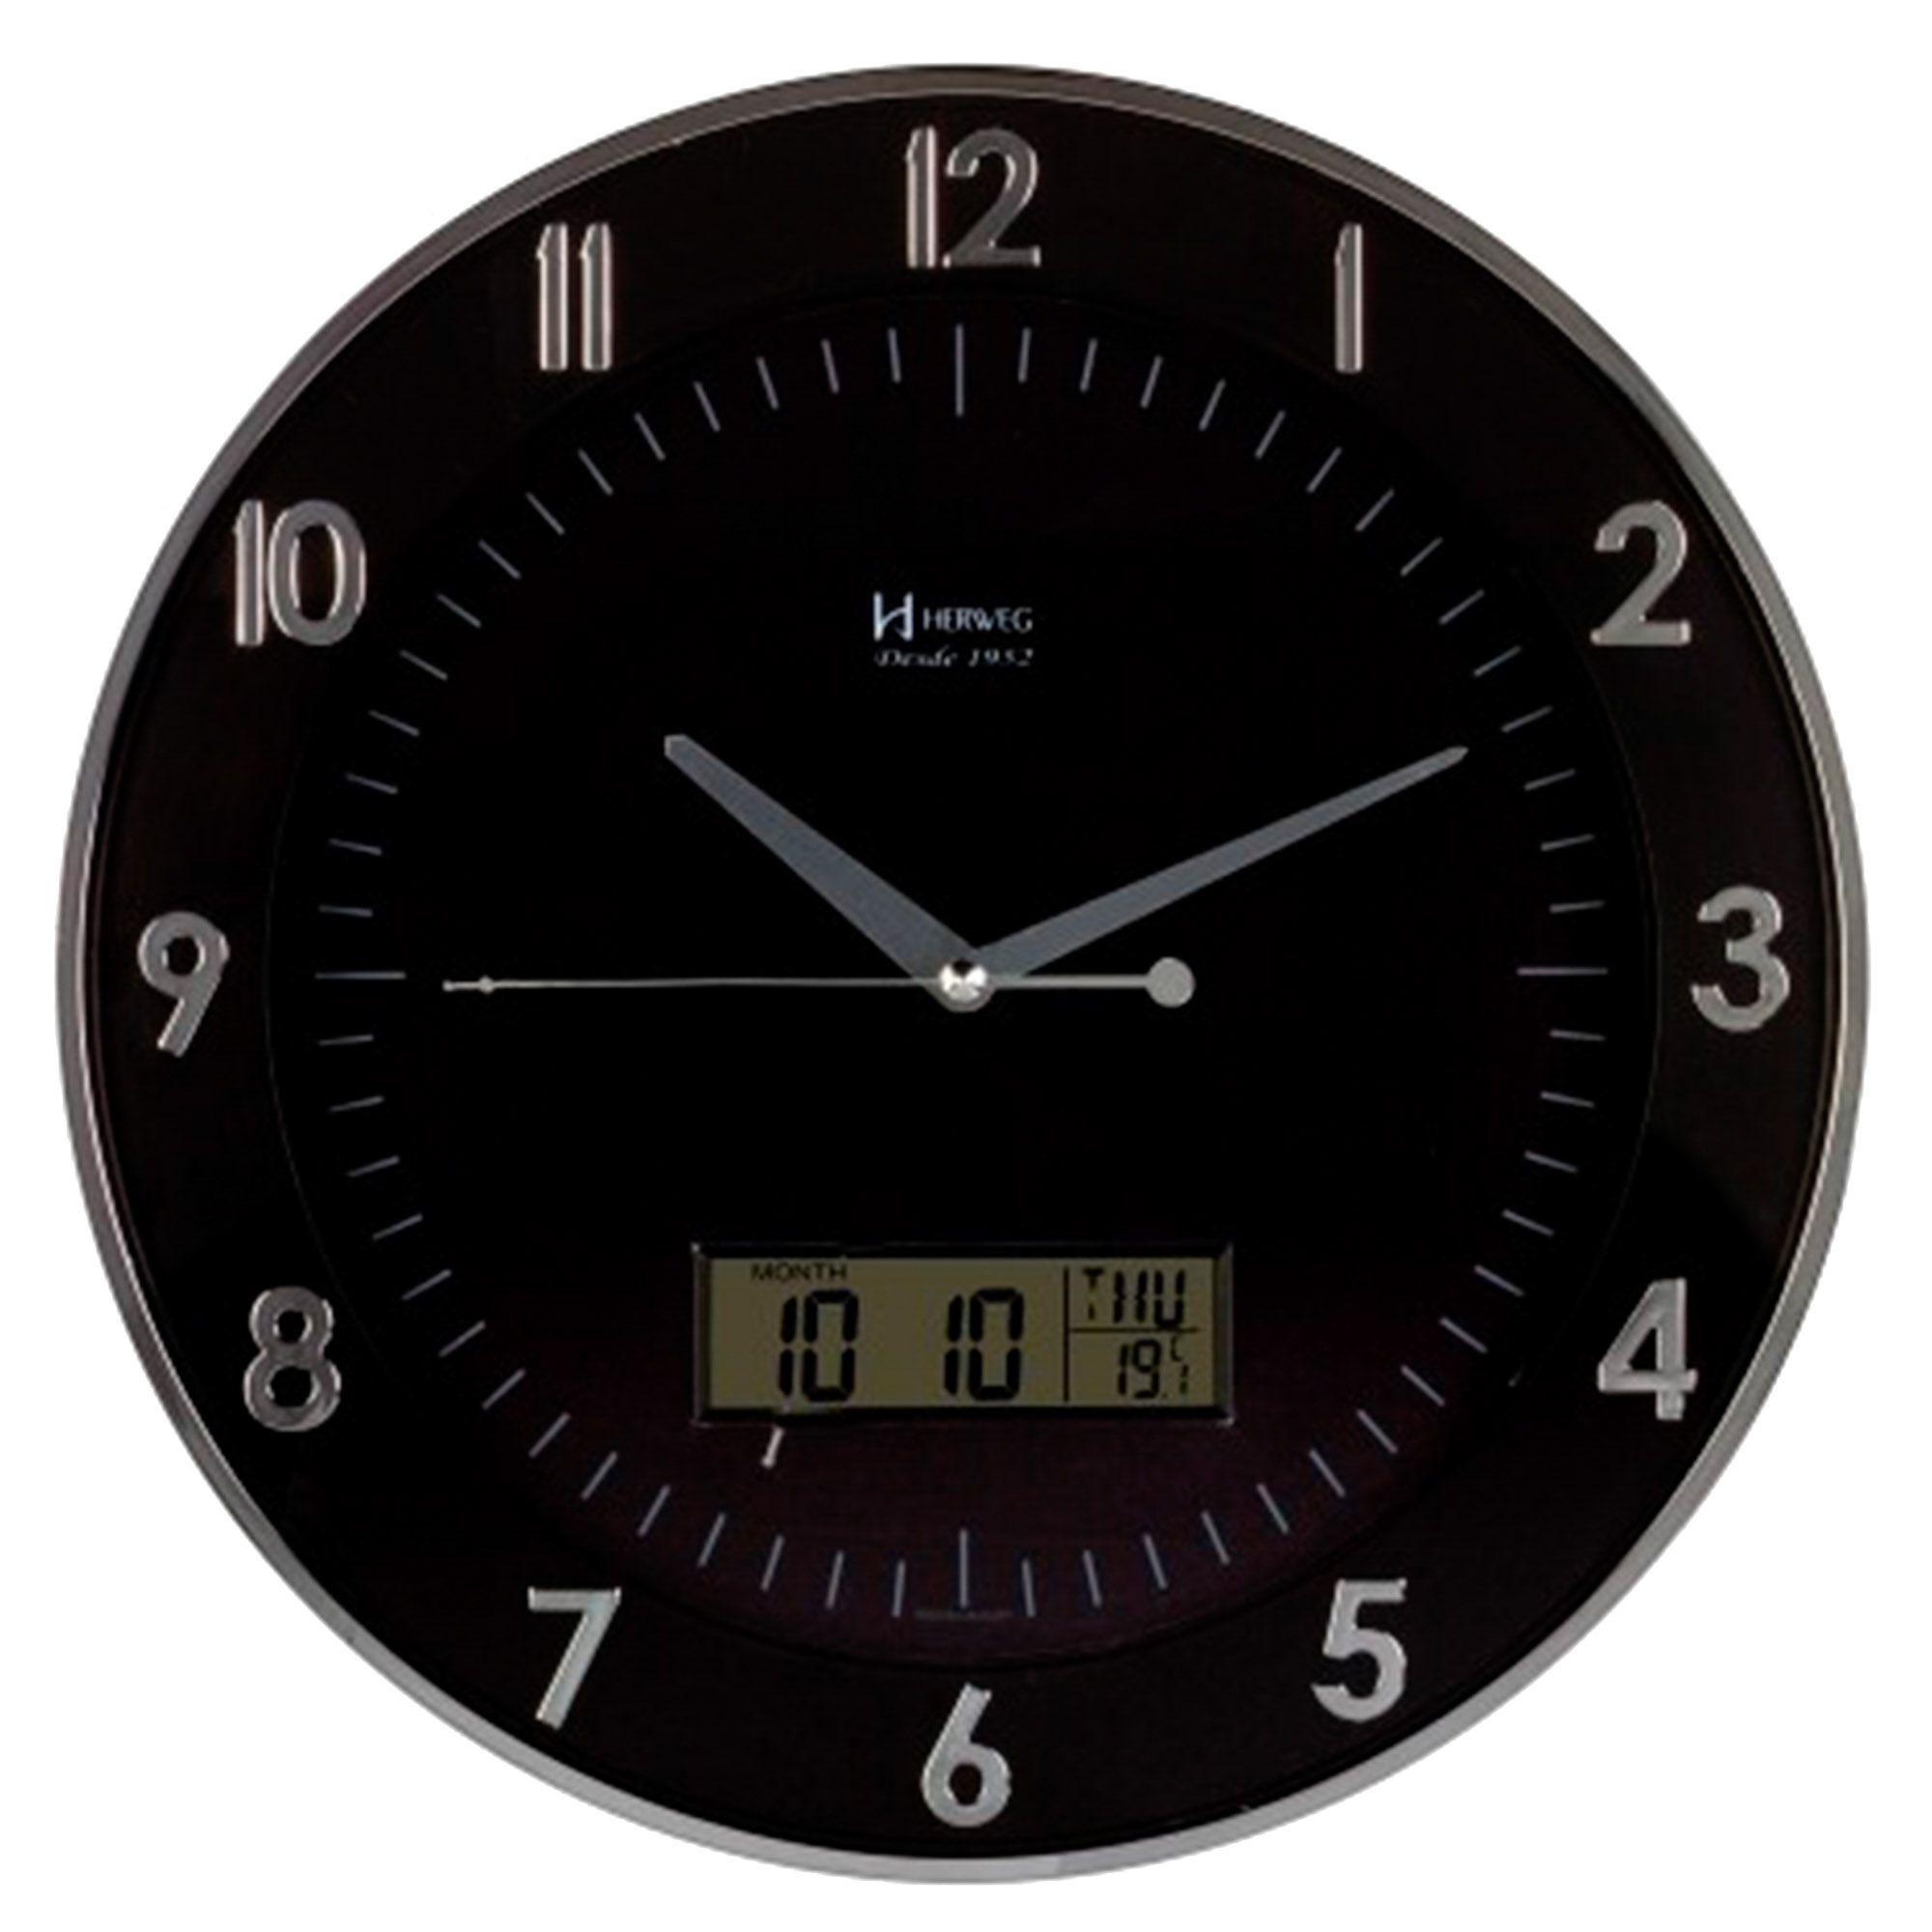 Relógio de Parede Anadigi Herweg 6804 028 Cromado